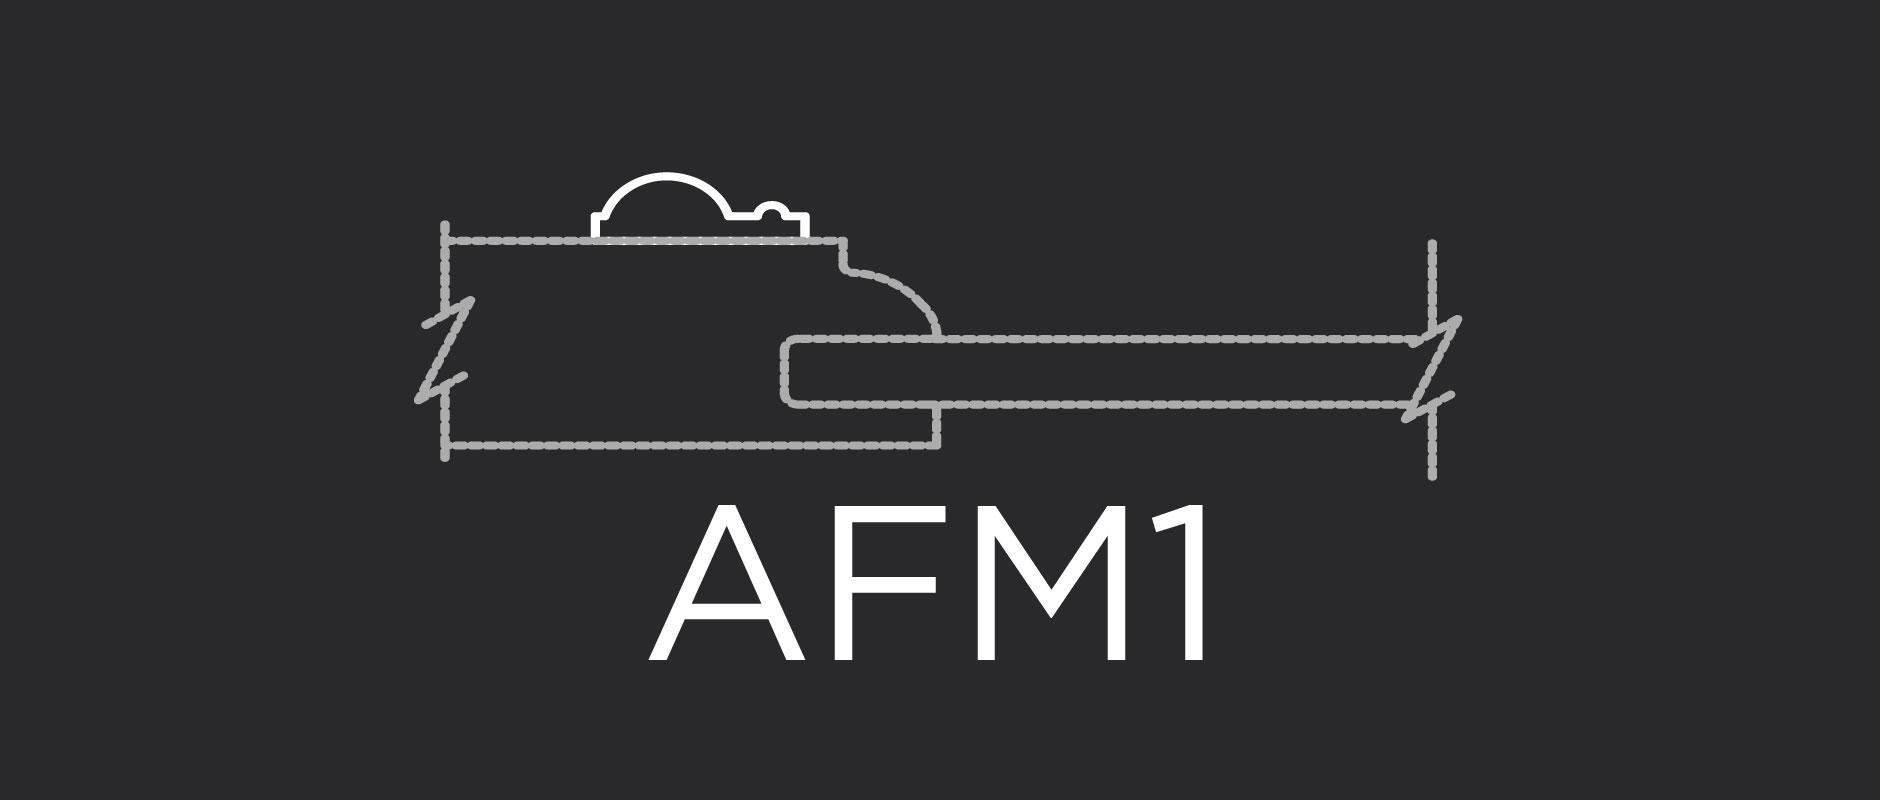 AFM1 face applied molding